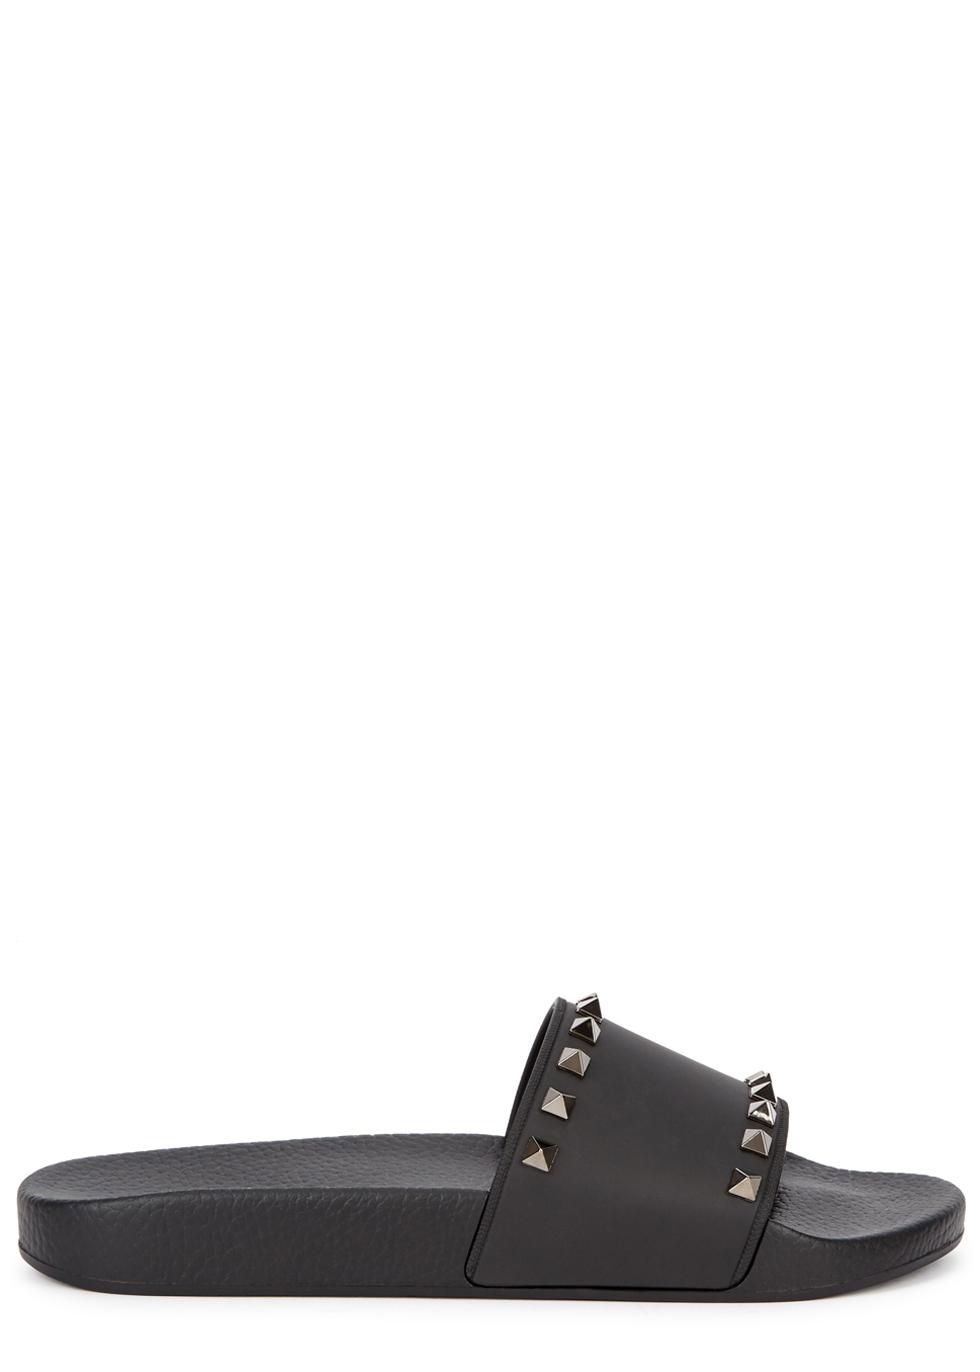 Valentino Garavani Rockstud black rubber sliders